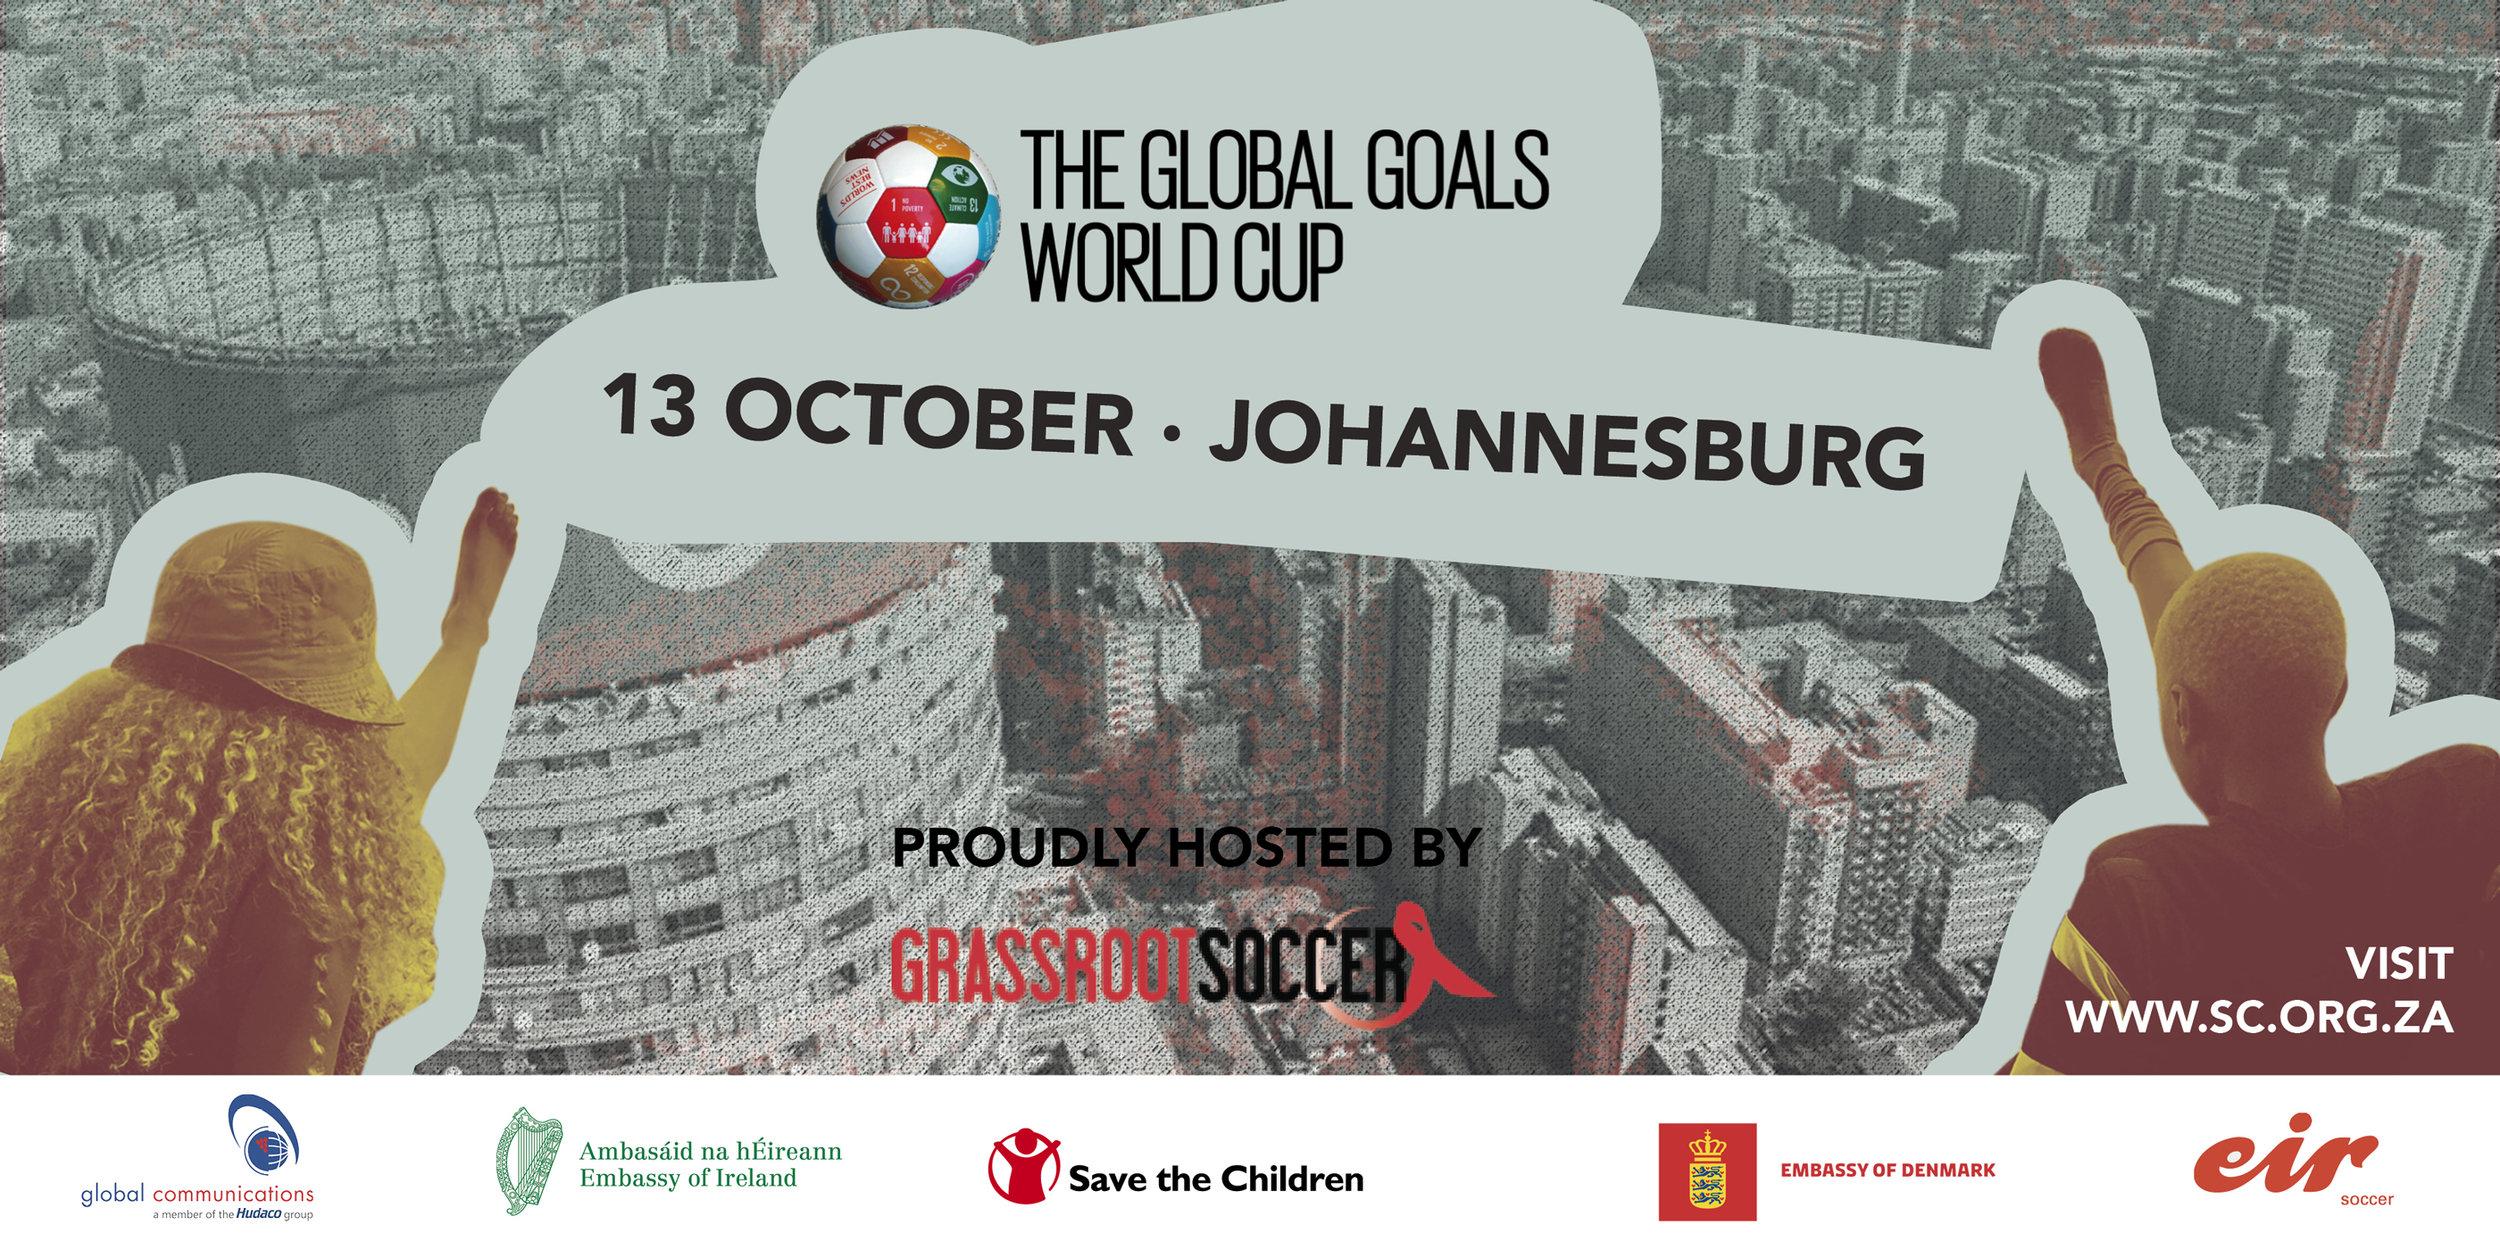 GGWC_Johannesburg_invite.jpg